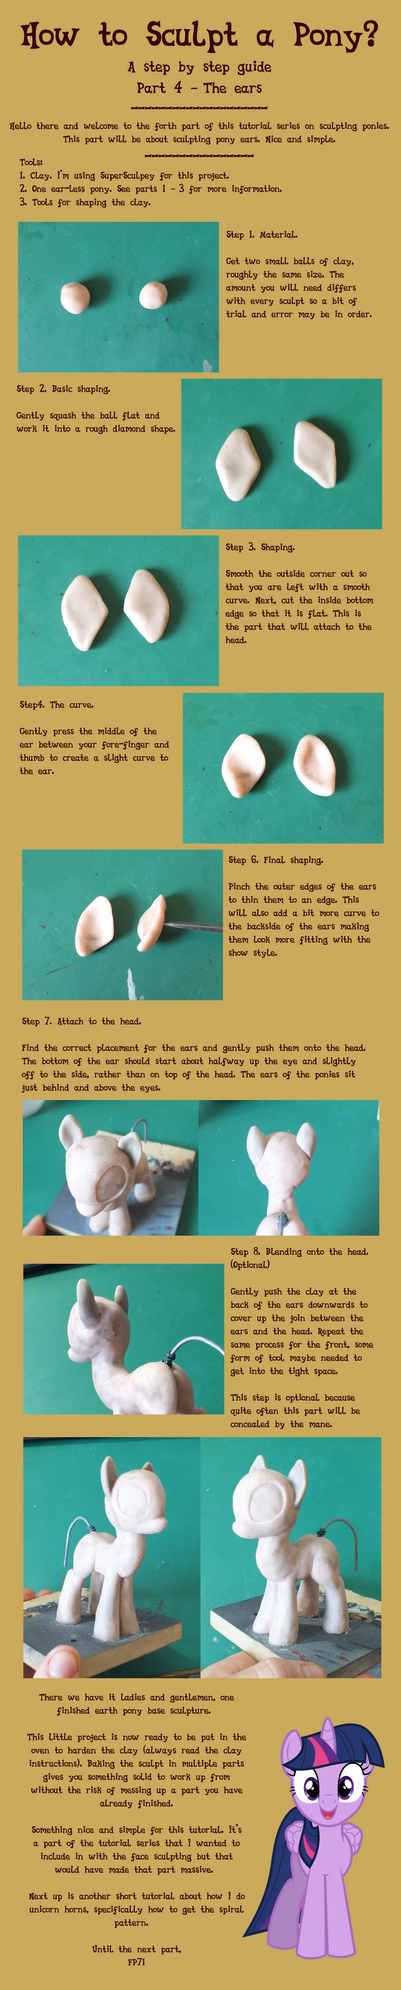 Tutorial series part 4: The ears.